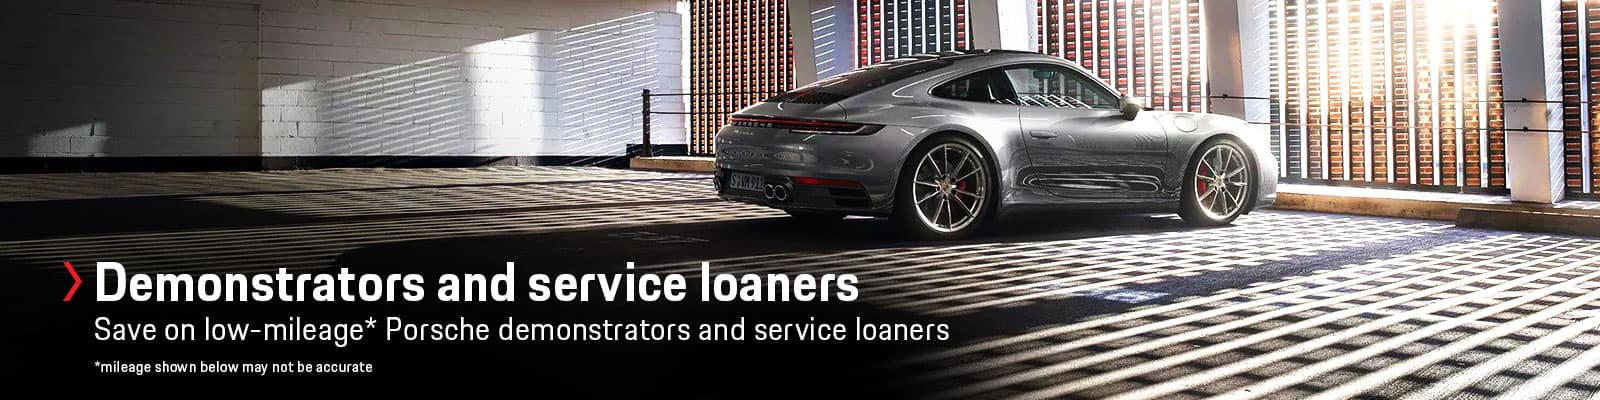 Sewickley Porsche Demonstrator For Sale